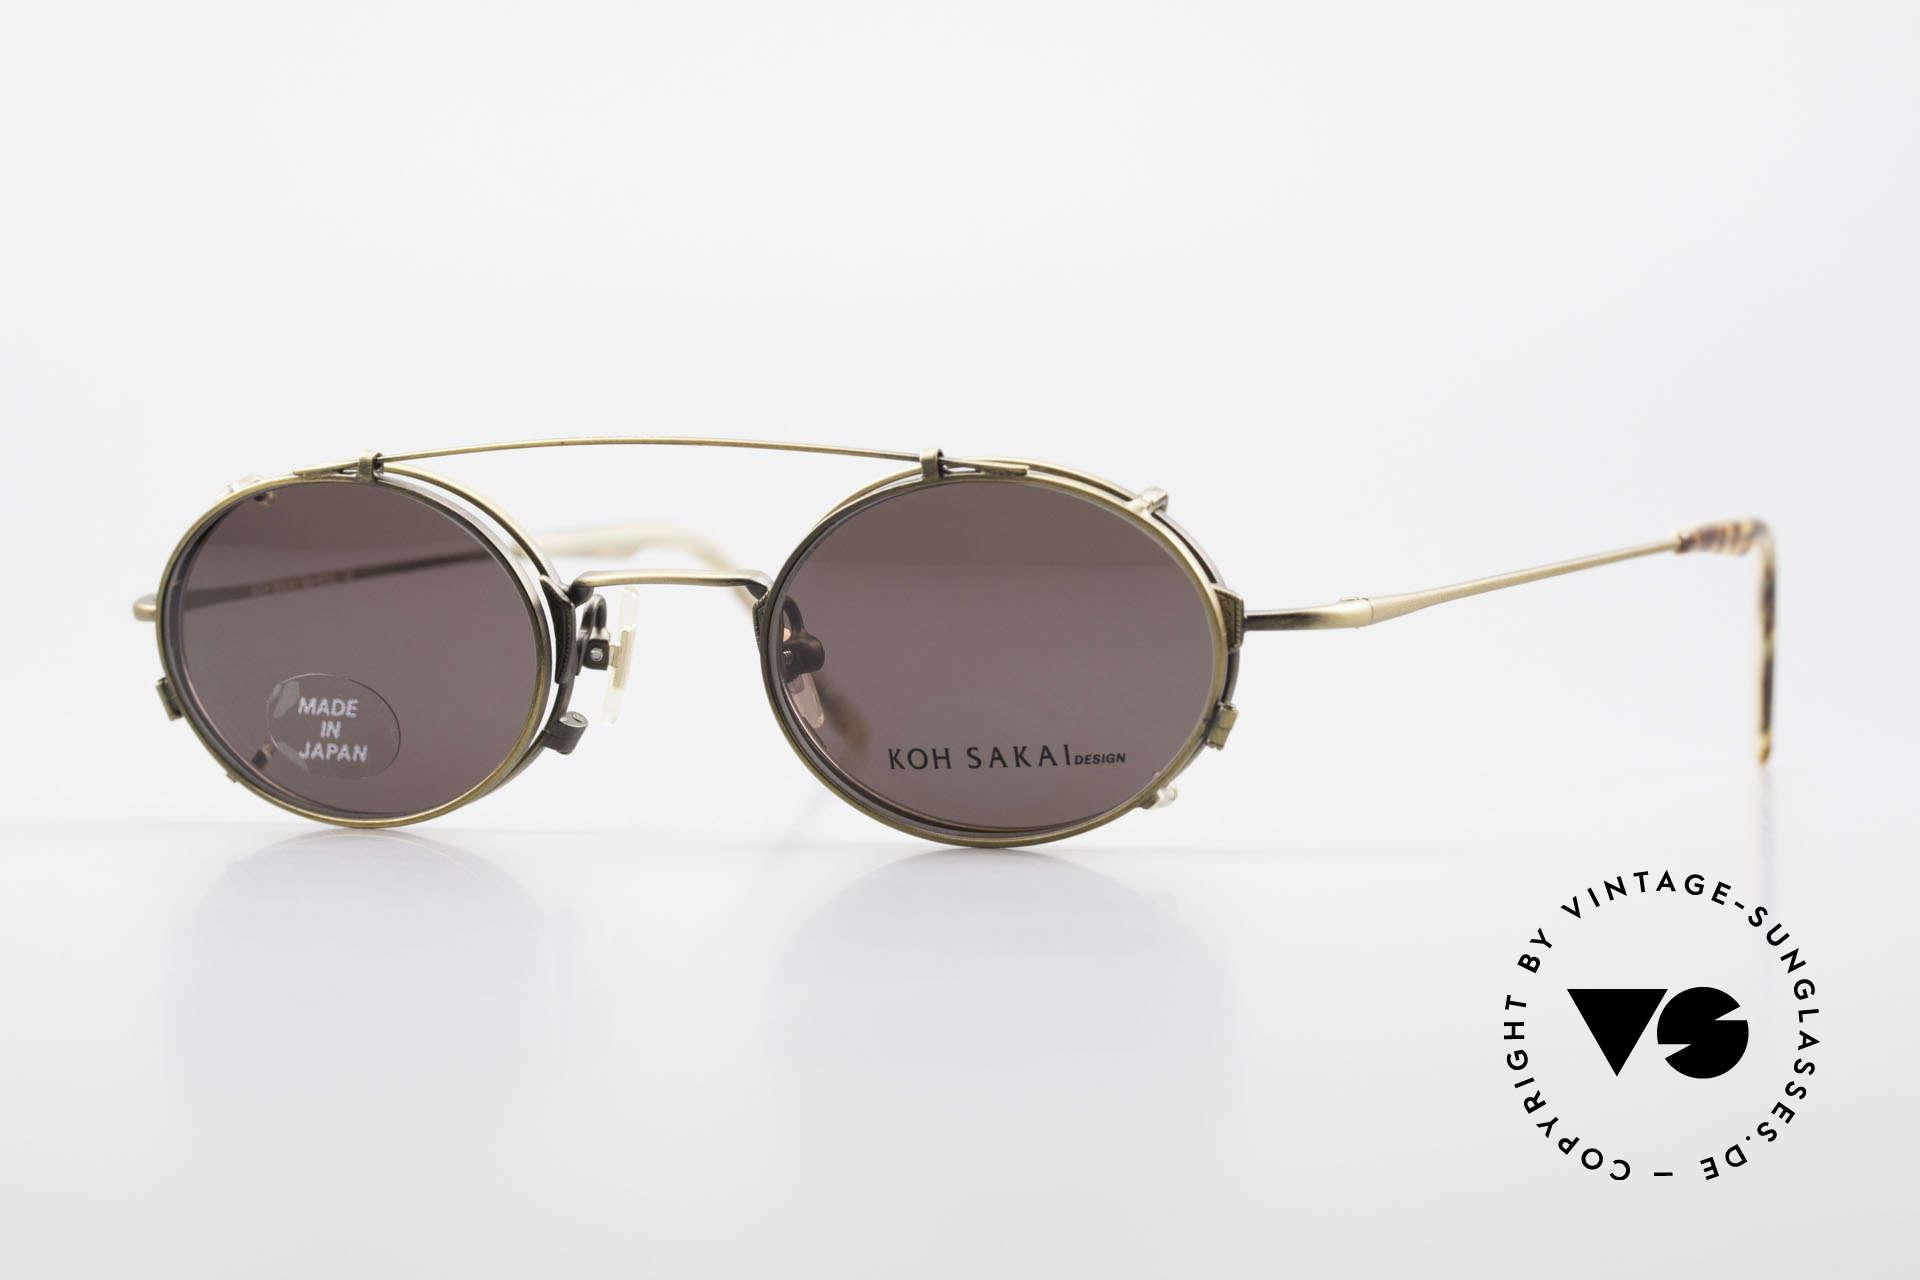 Koh Sakai KS9711 Vintage Glasses Oval Clip On, vintage glasses Koh Sakai KS9711, 43-21, with clip-on, Made for Men and Women